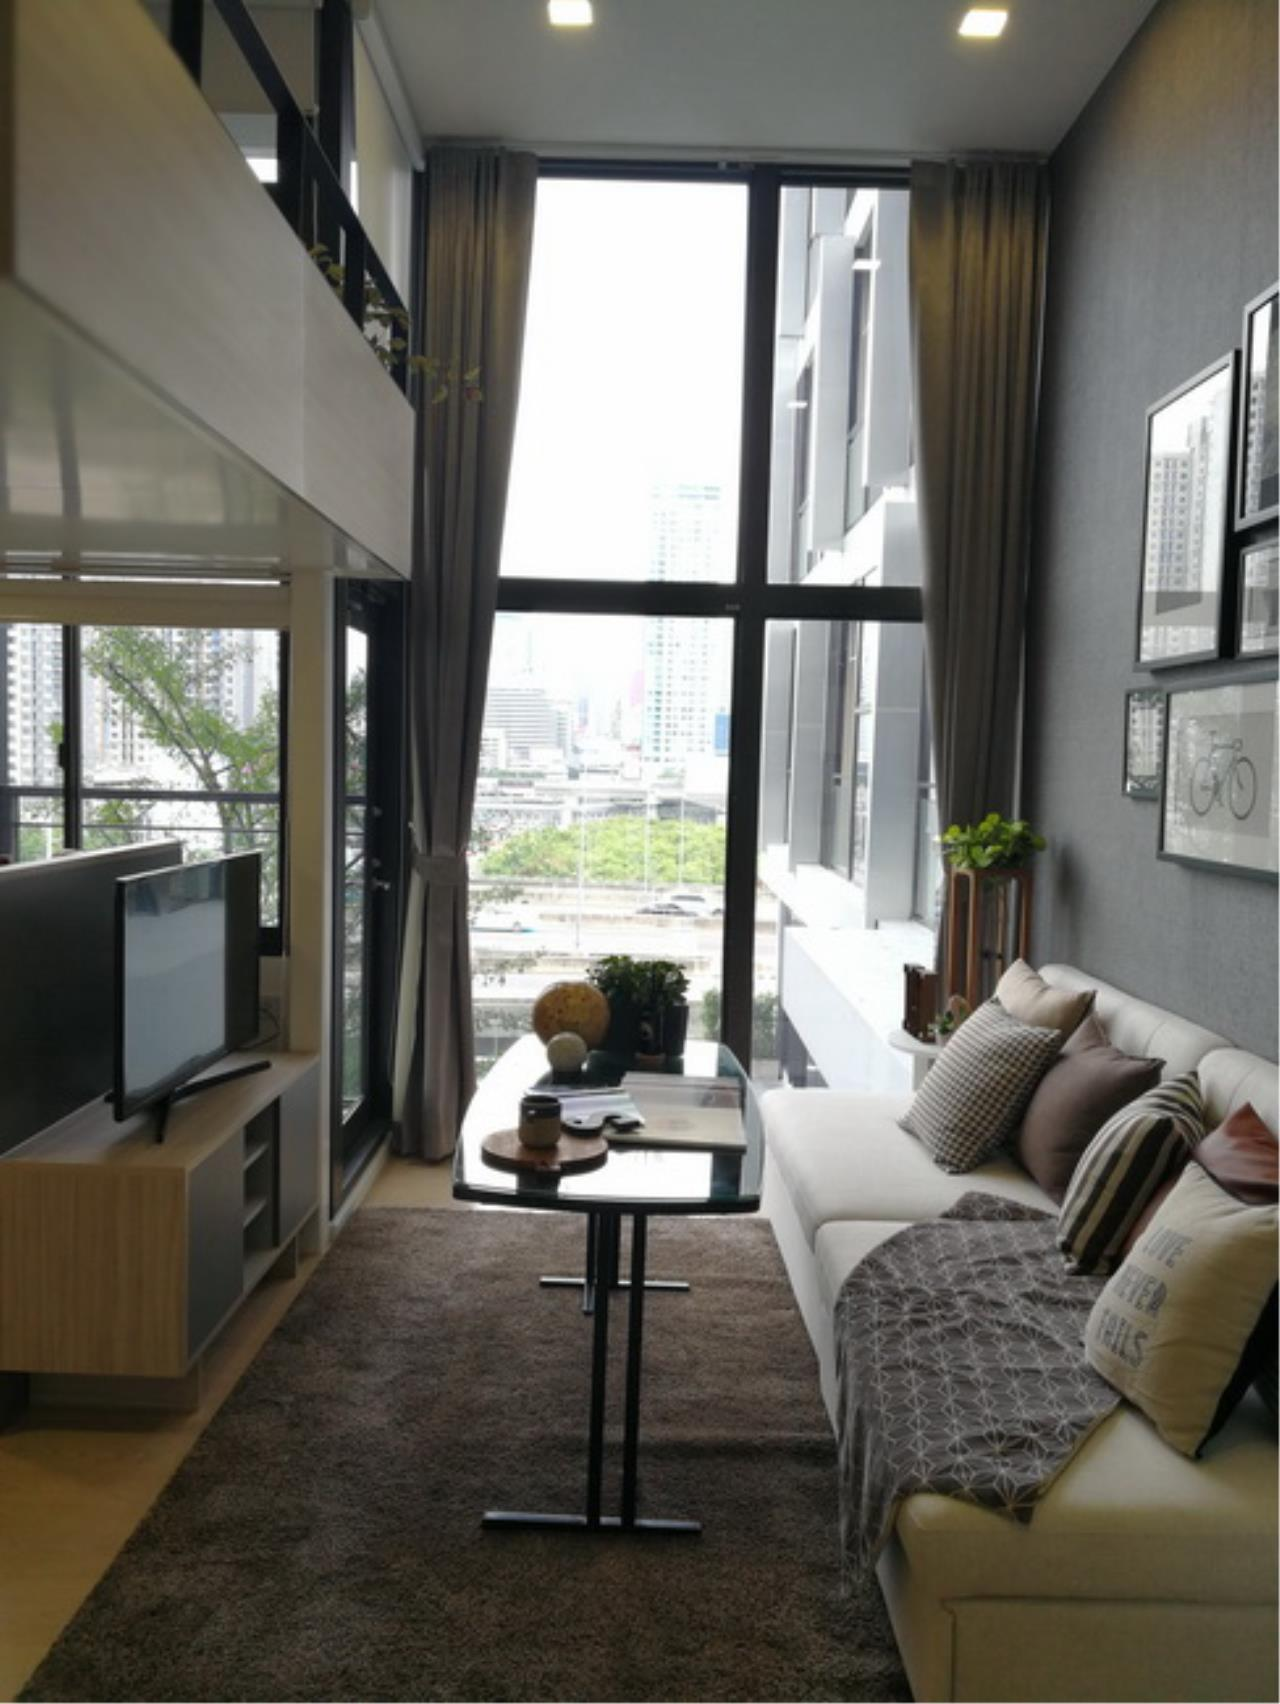 37935 - For Rent Chewathai Residence Asoke Road. Duplex room 35.55 sq.m.